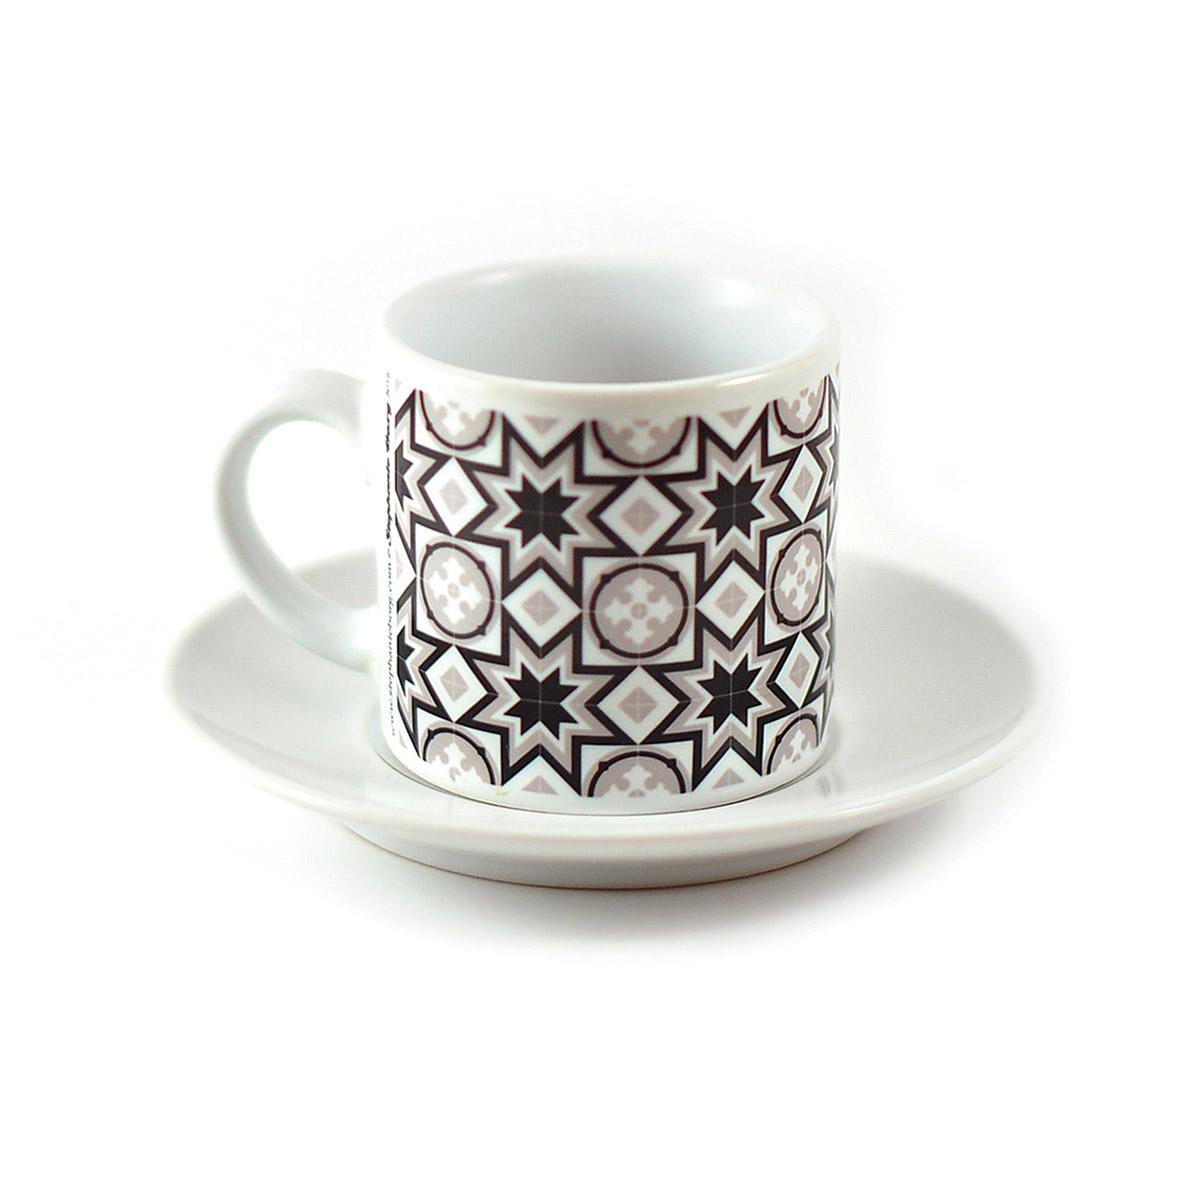 Malta Tile Espresso Cup & Saucer, pattern no.8